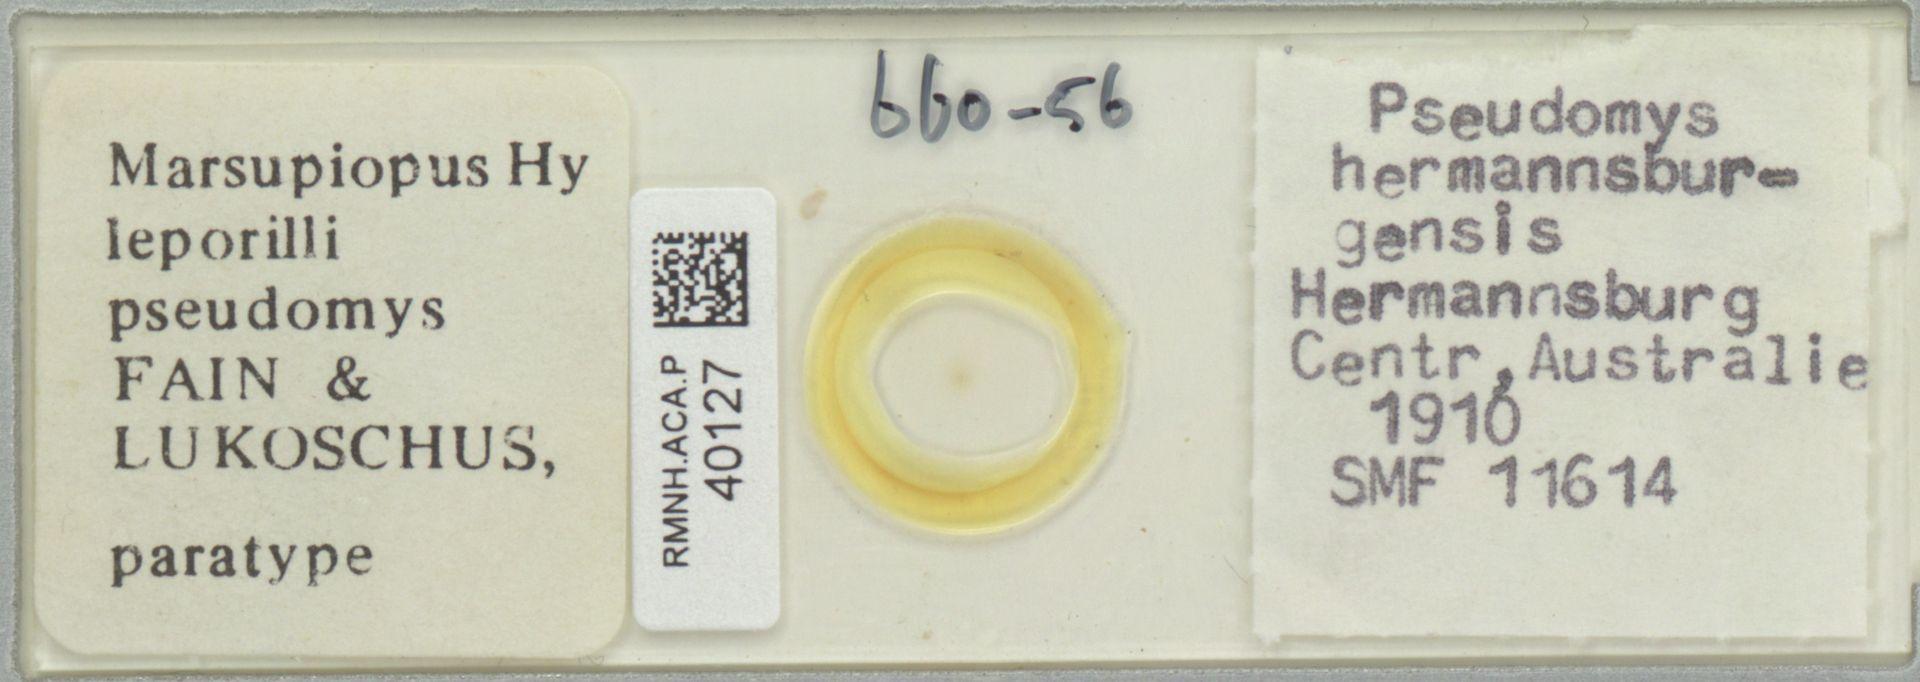 RMNH.ACA.P.40127   Marsupiopus (Hy) leporilli pseudomys Fain & Lukoschus